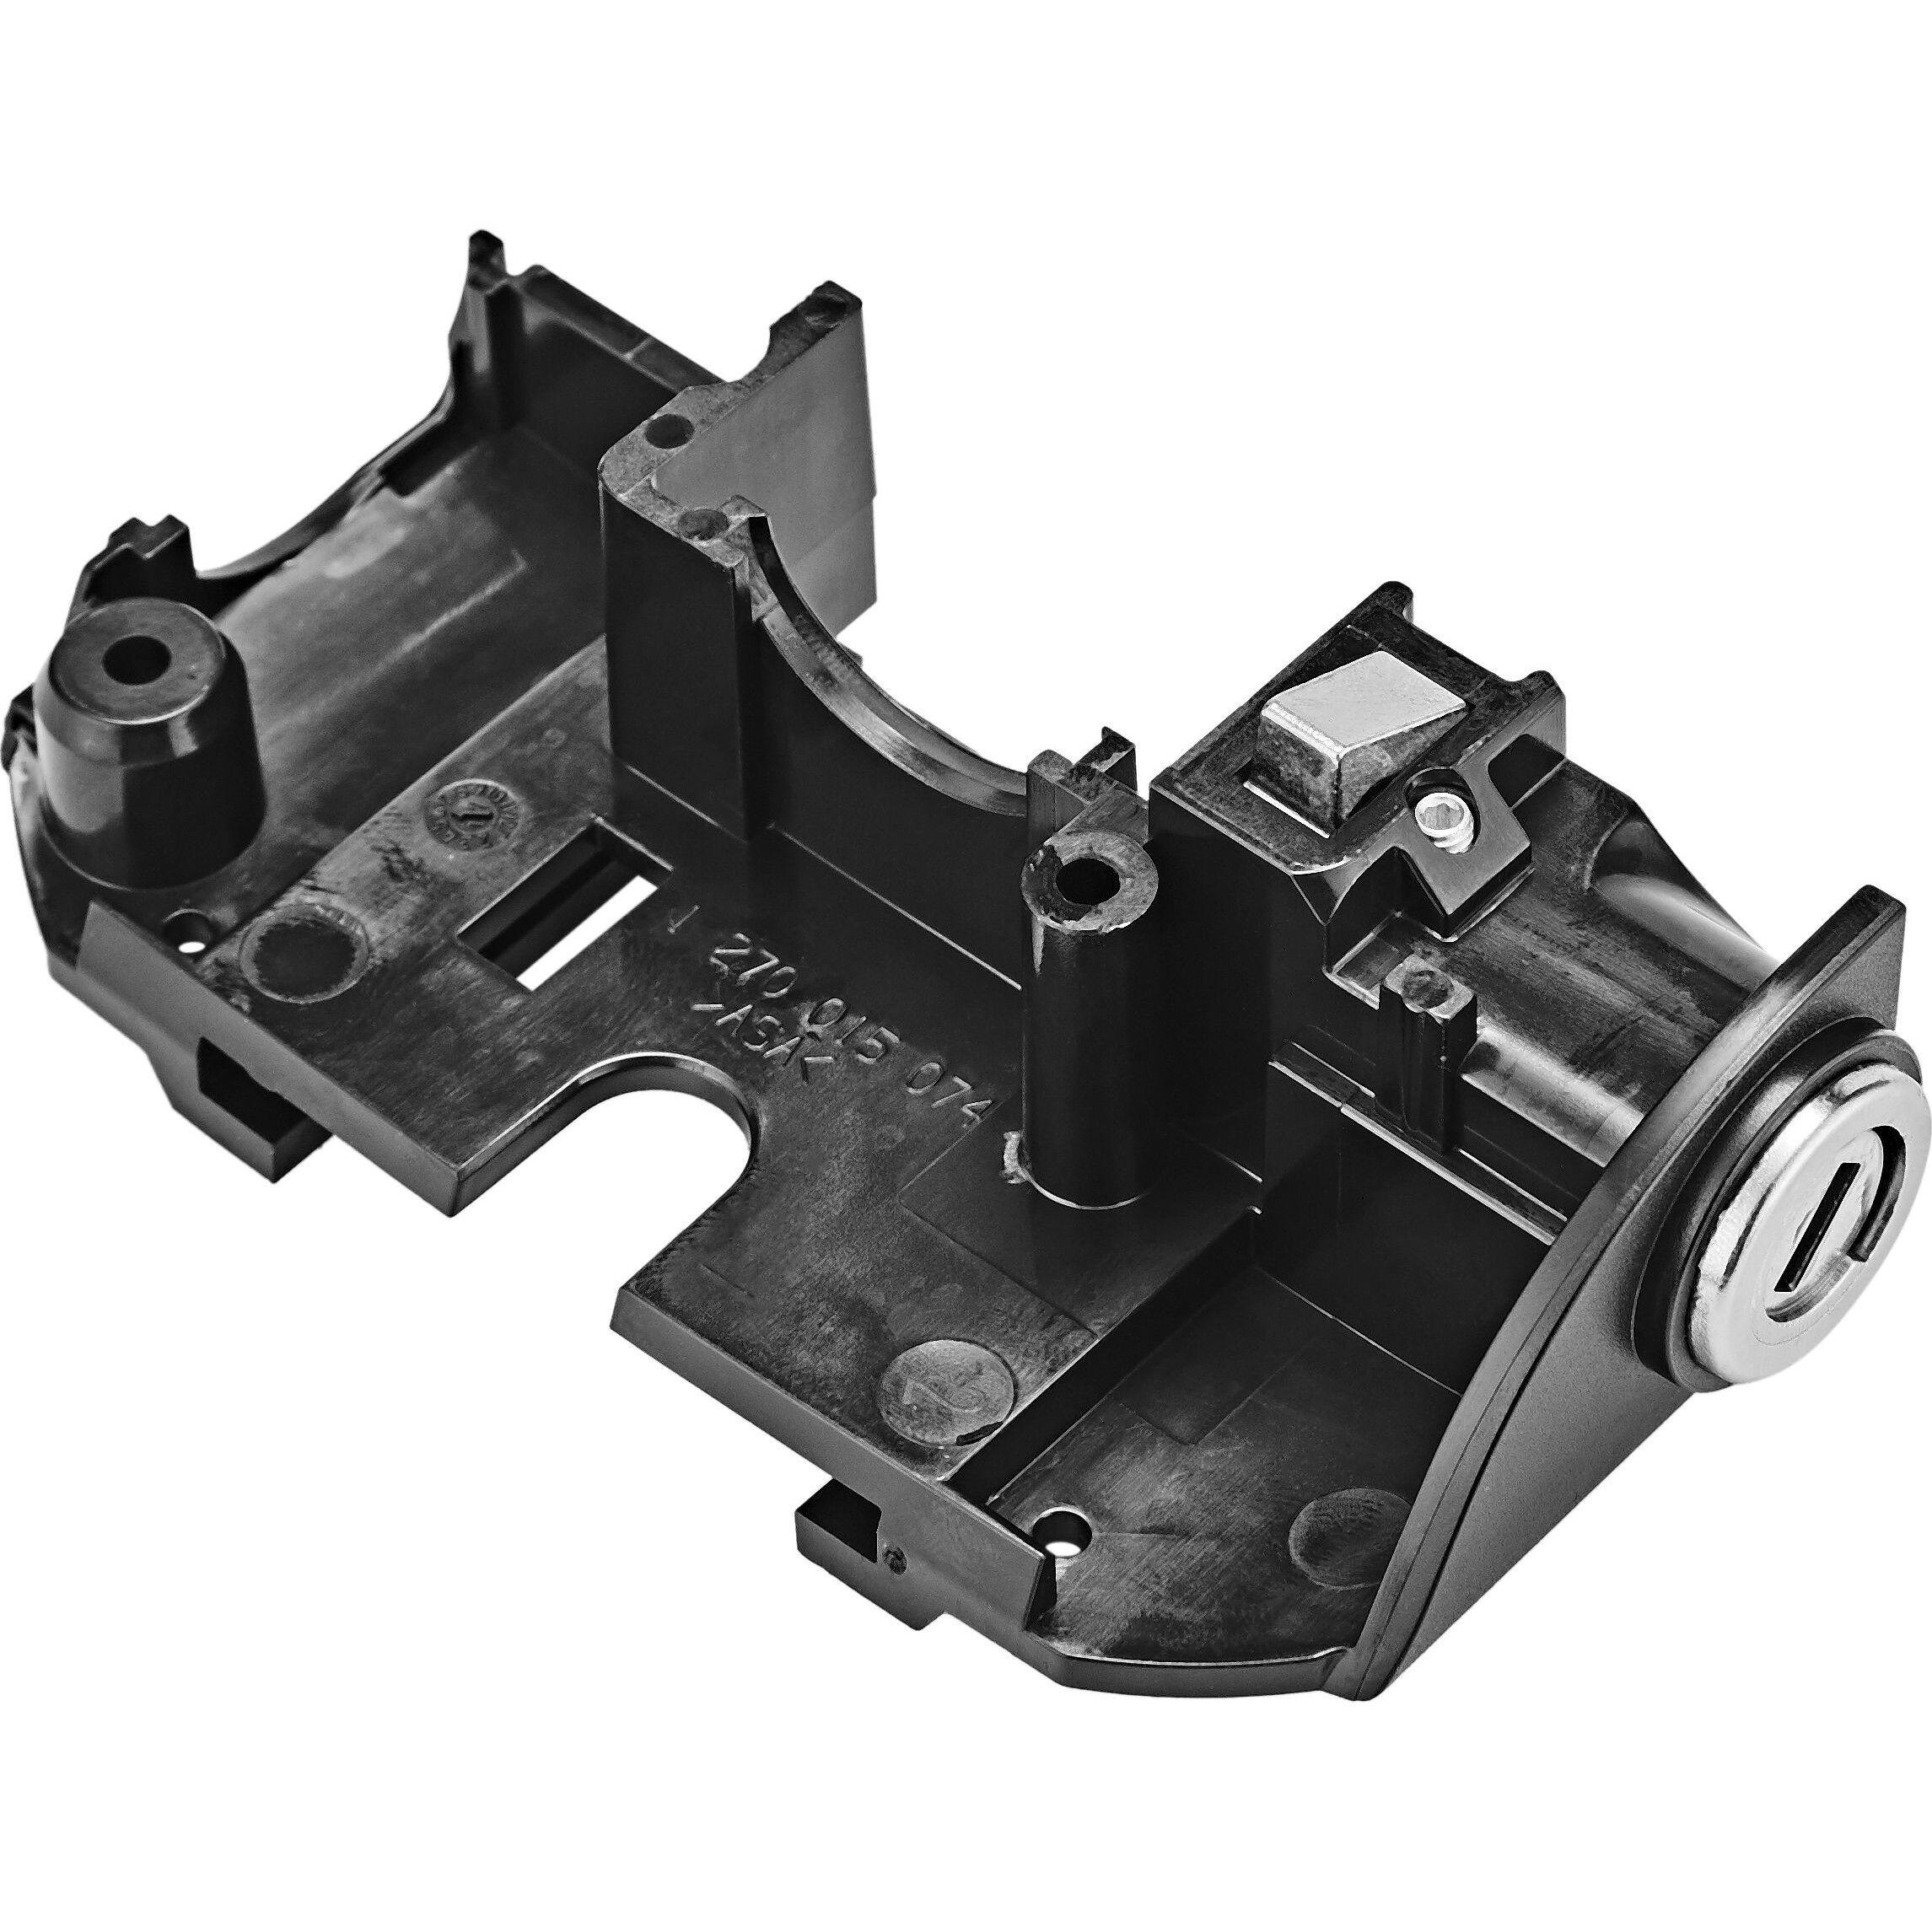 Axa One Key System Rahmenschloss für Bosch Gepäckmontage Schlüssel abziehbar